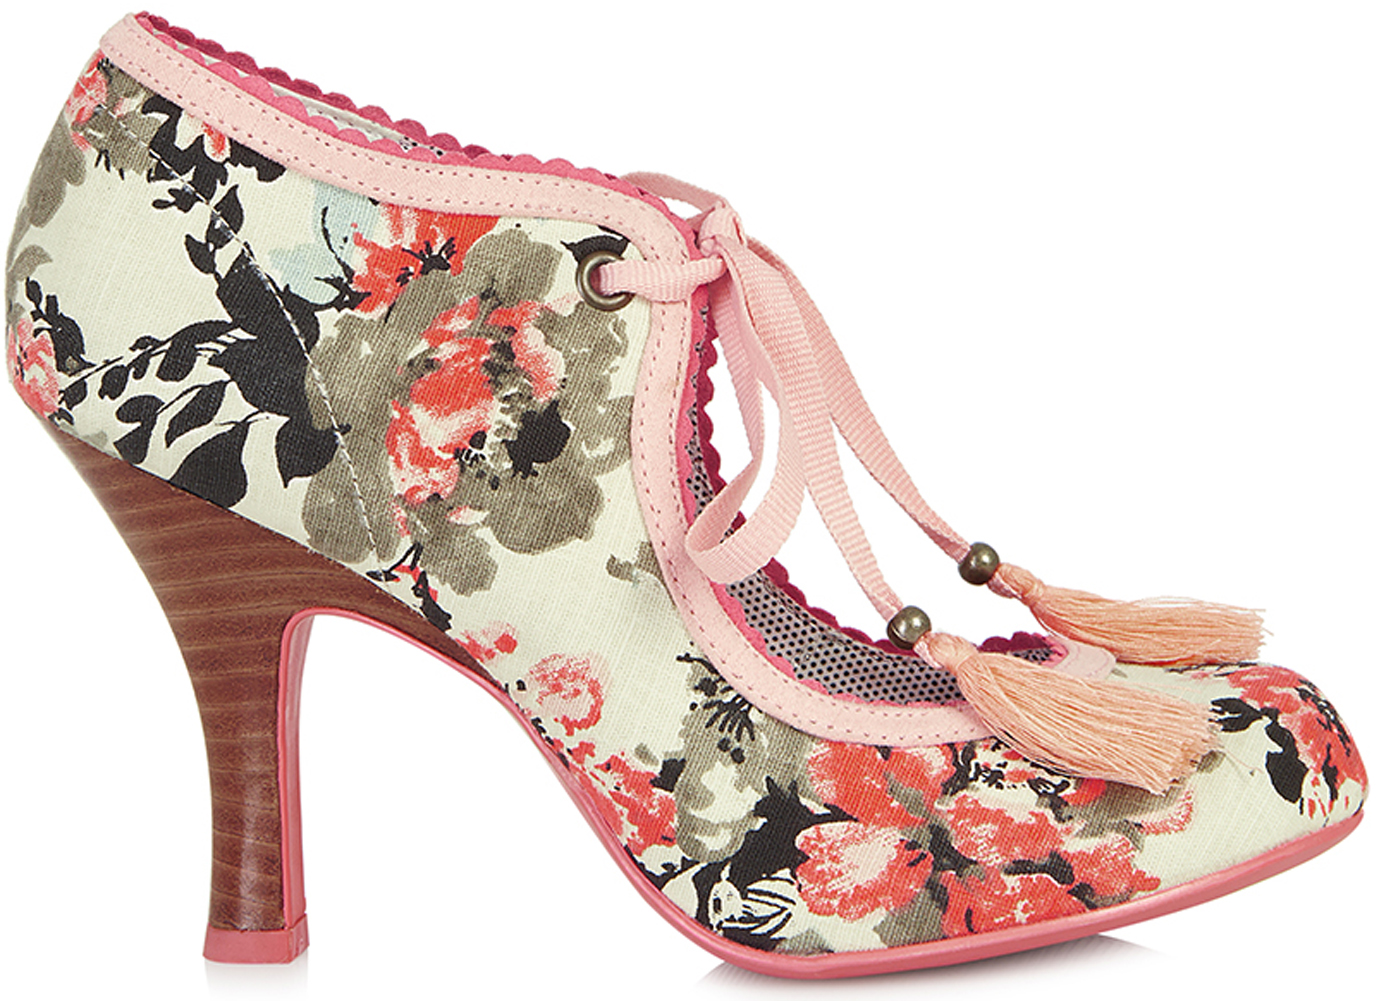 Ruby Shoo WILLOW 50s Vintage Blüten FLOWER Hochfront Pumps Rockabilly